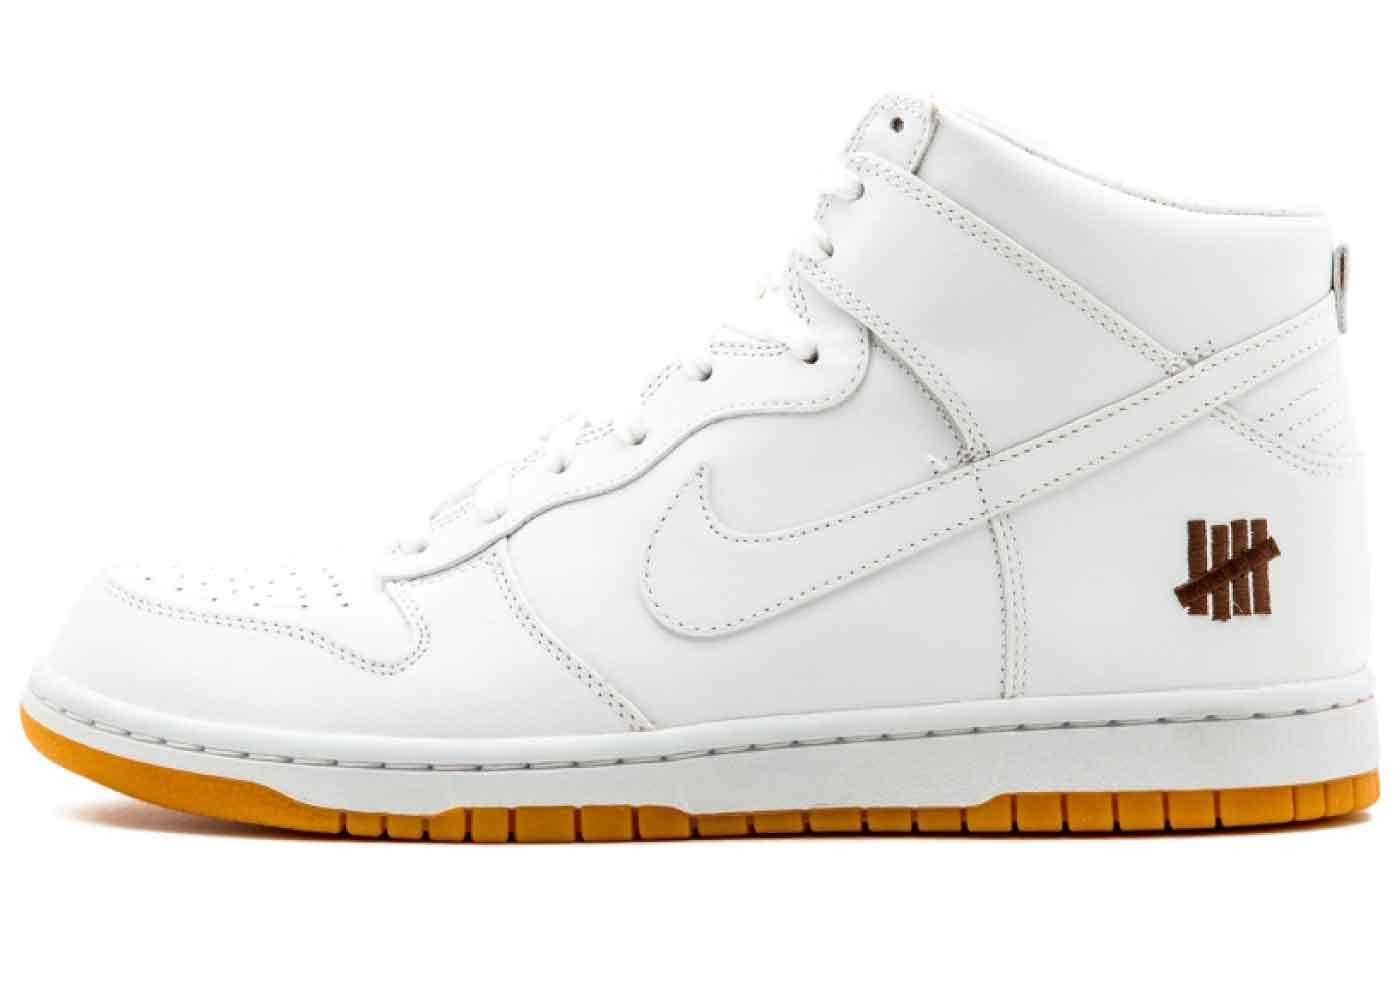 Nike Dunk High UNDFTD Bring Back Pack Whiteの写真